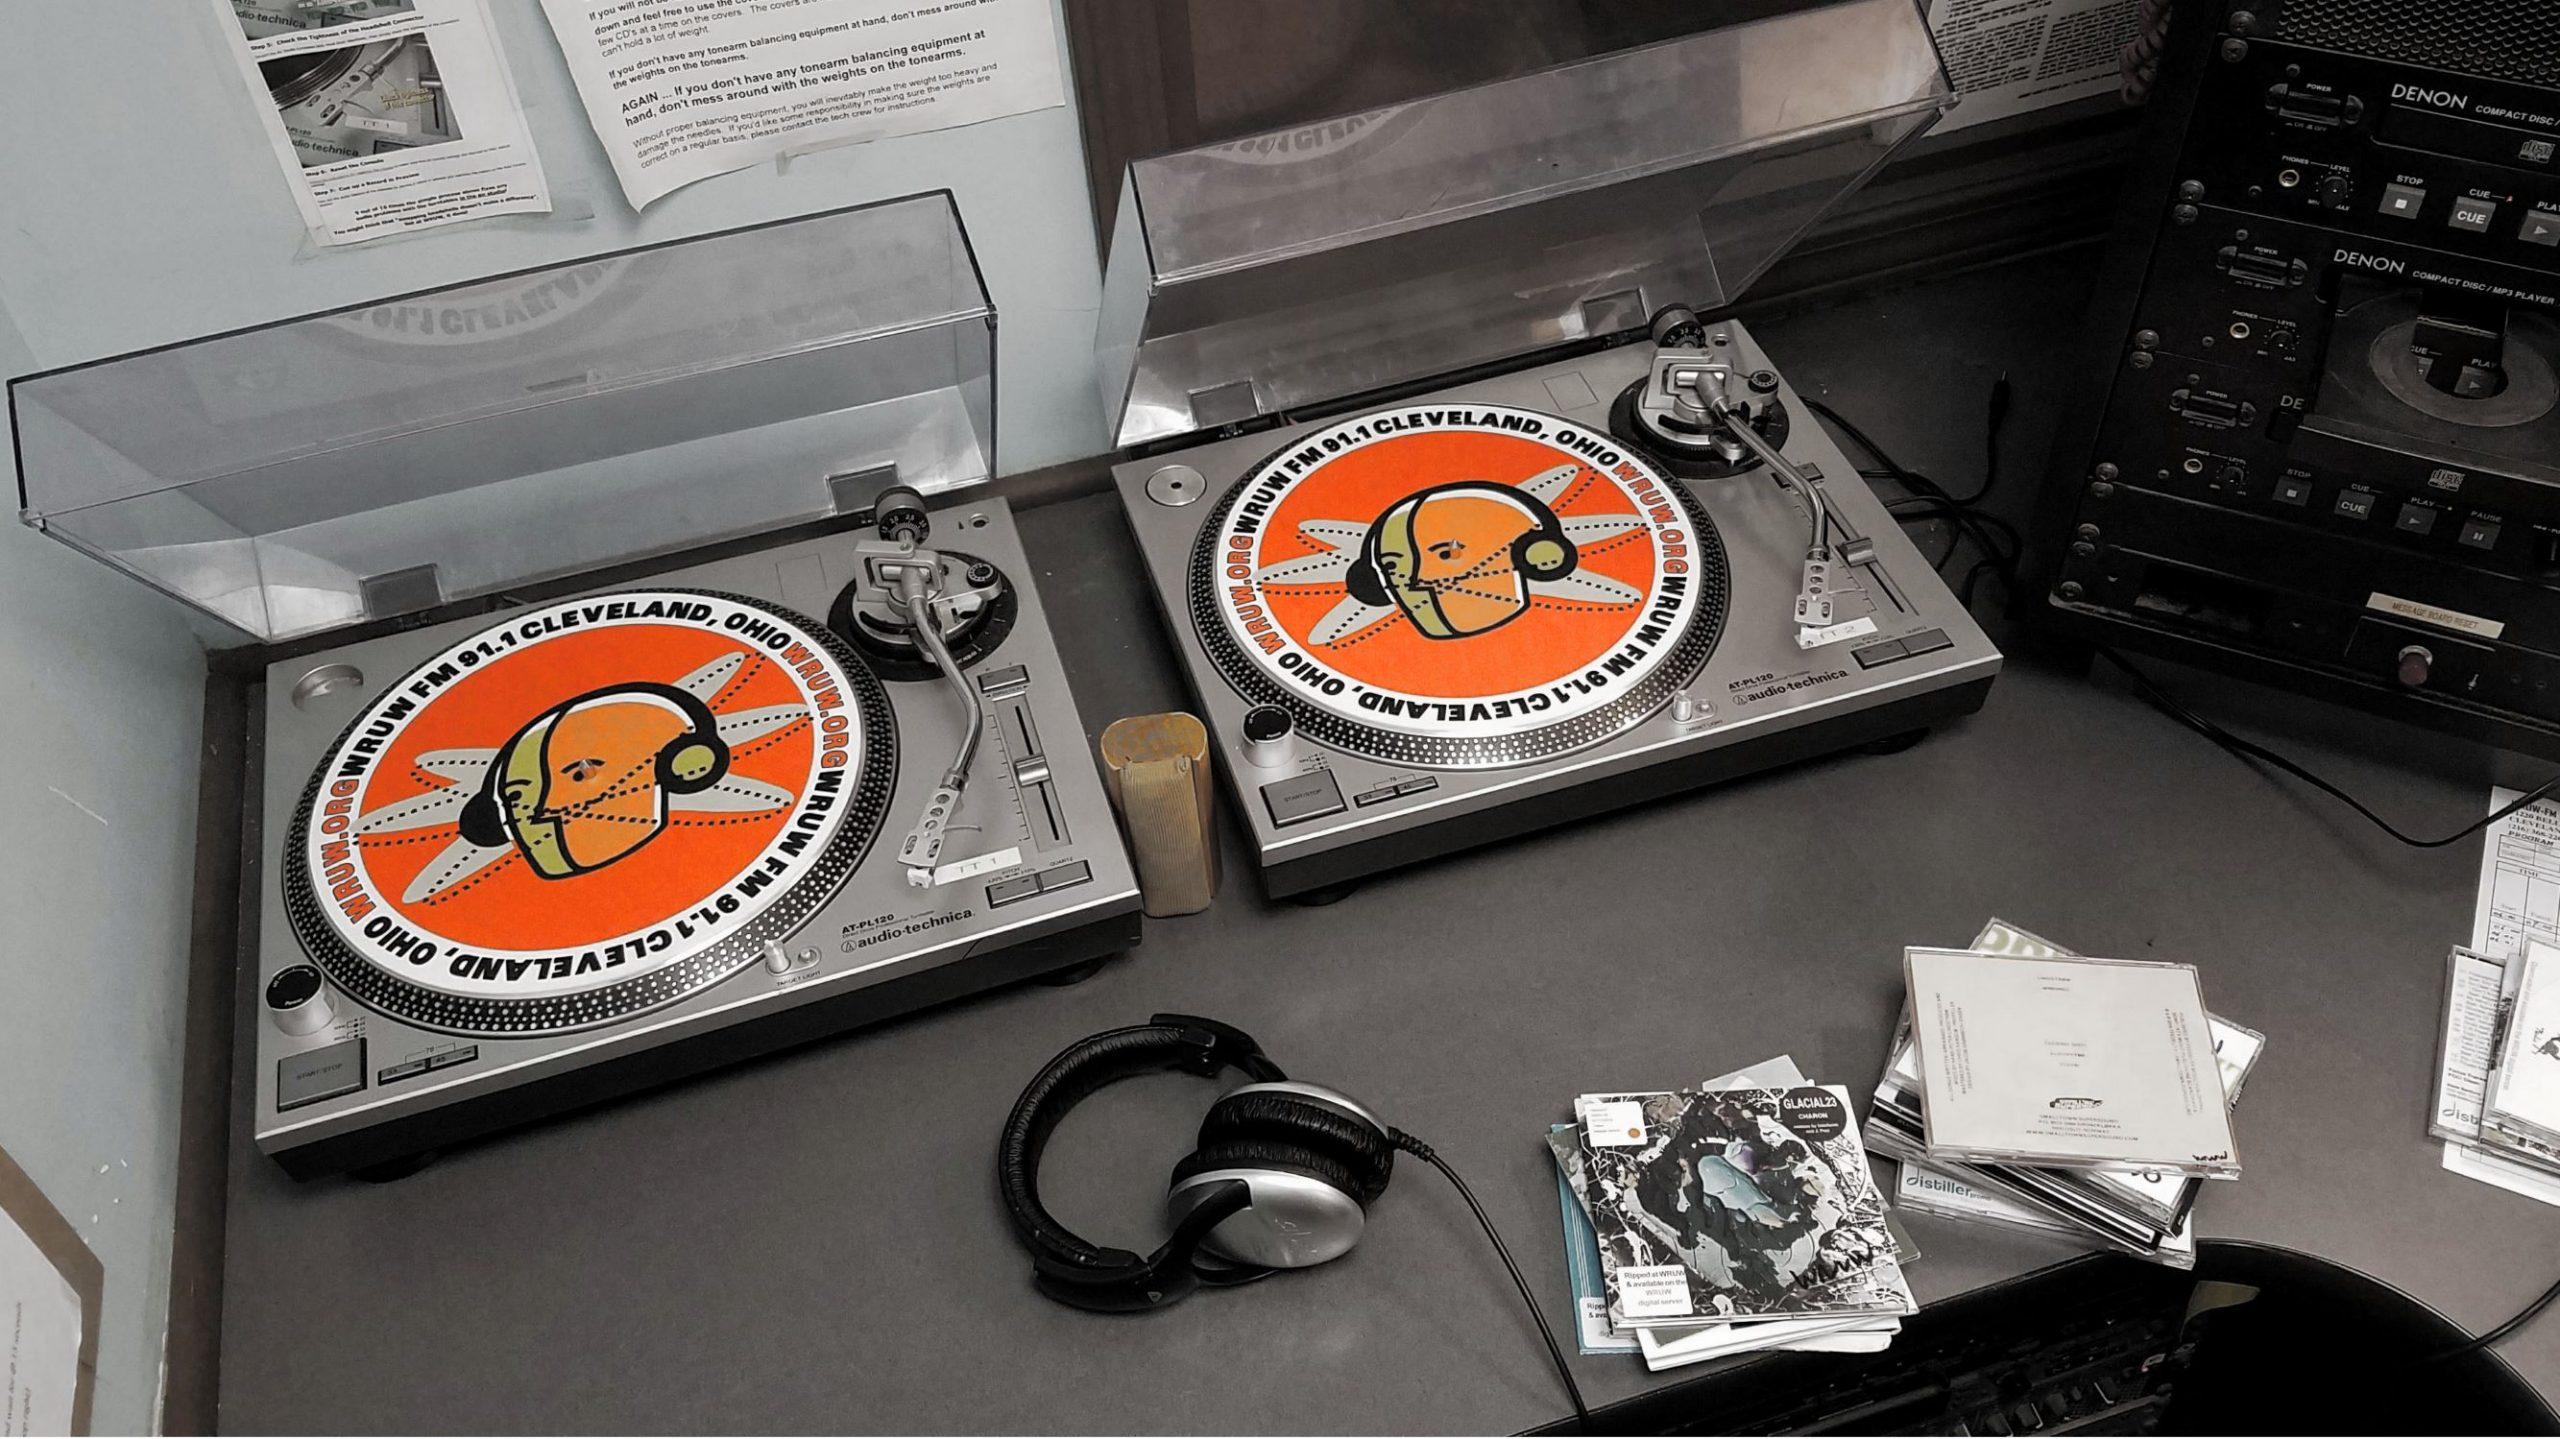 WRUW turntables with visible orange radio head logo